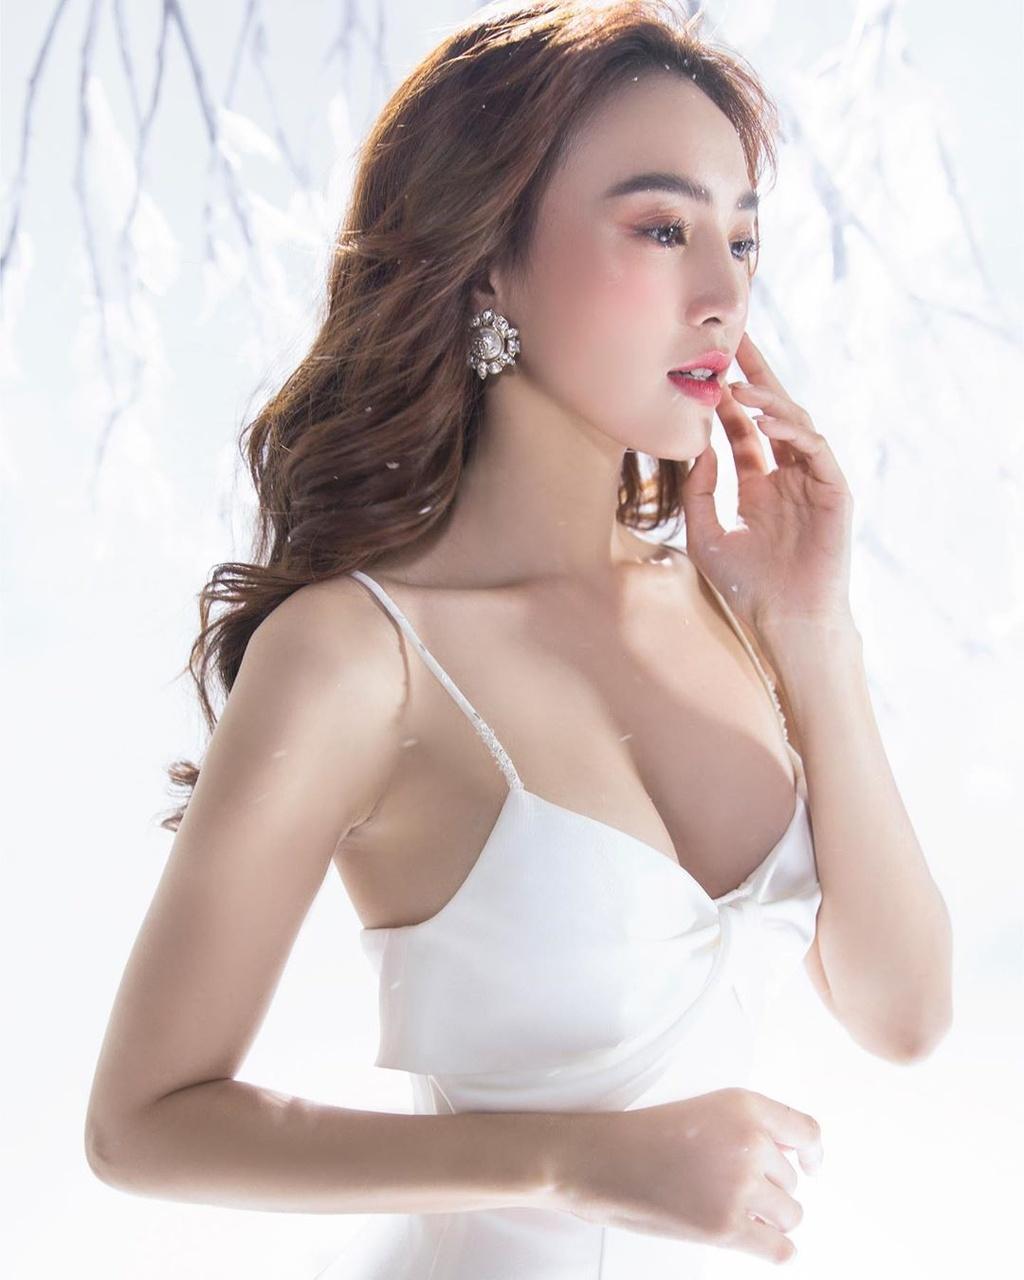 Su thay doi ngay cang goi cam cua Ninh Duong Lan Ngoc hinh anh 3 ninh.duong.lan.ngoc_79371665_159192718758419_9083719128359797089_n.jpg